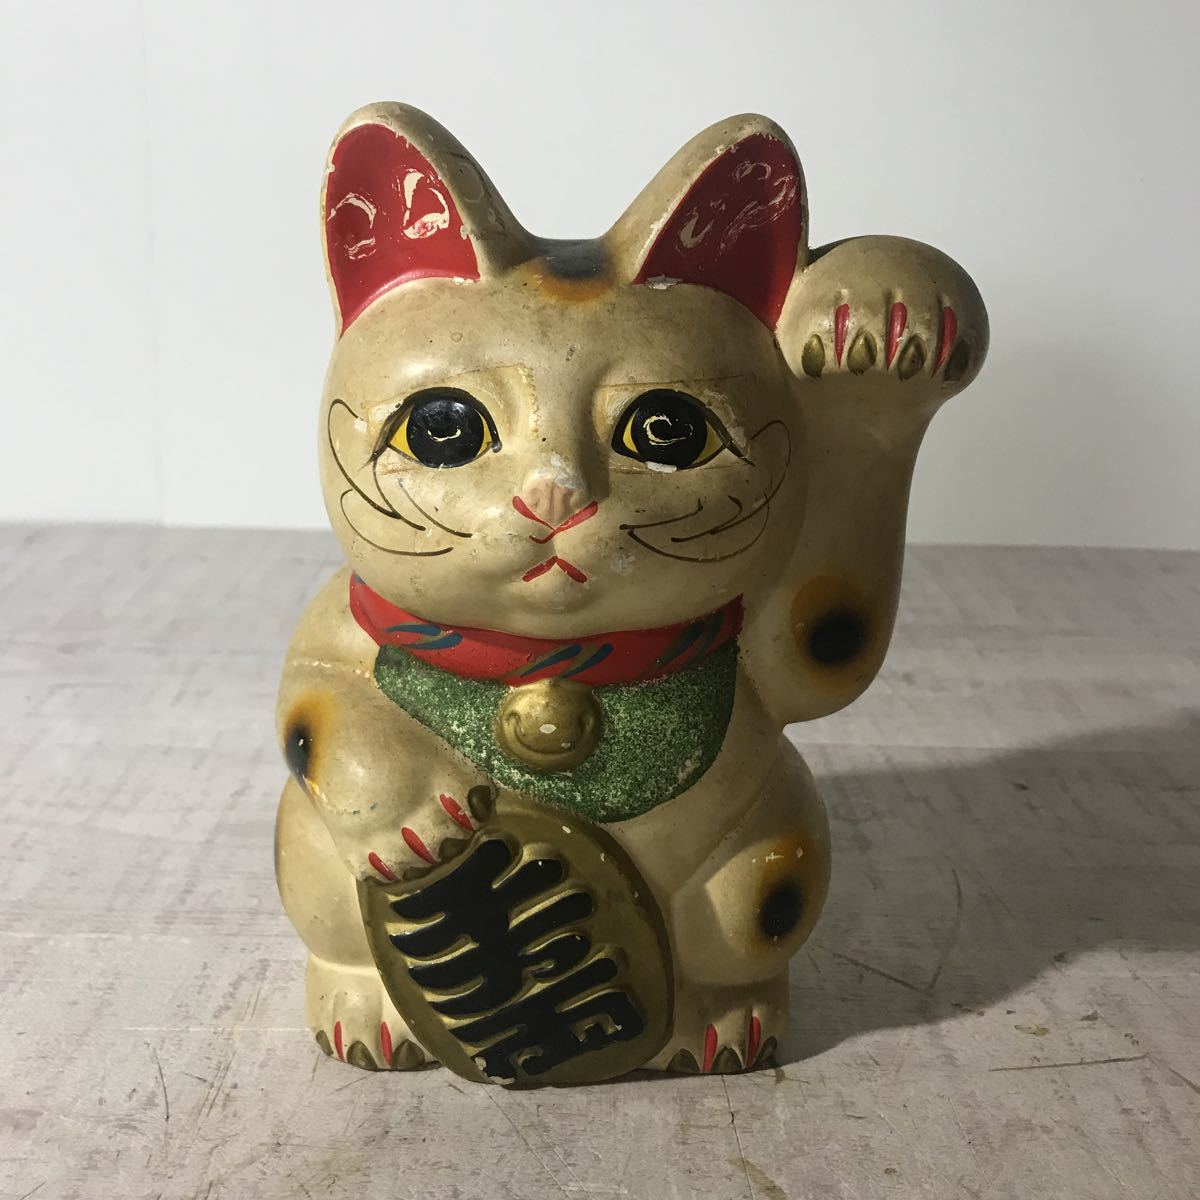 0925-3 蔵出し 城下町山形旧商店排出品 時代物 古い招き猫貯金箱 大_画像1